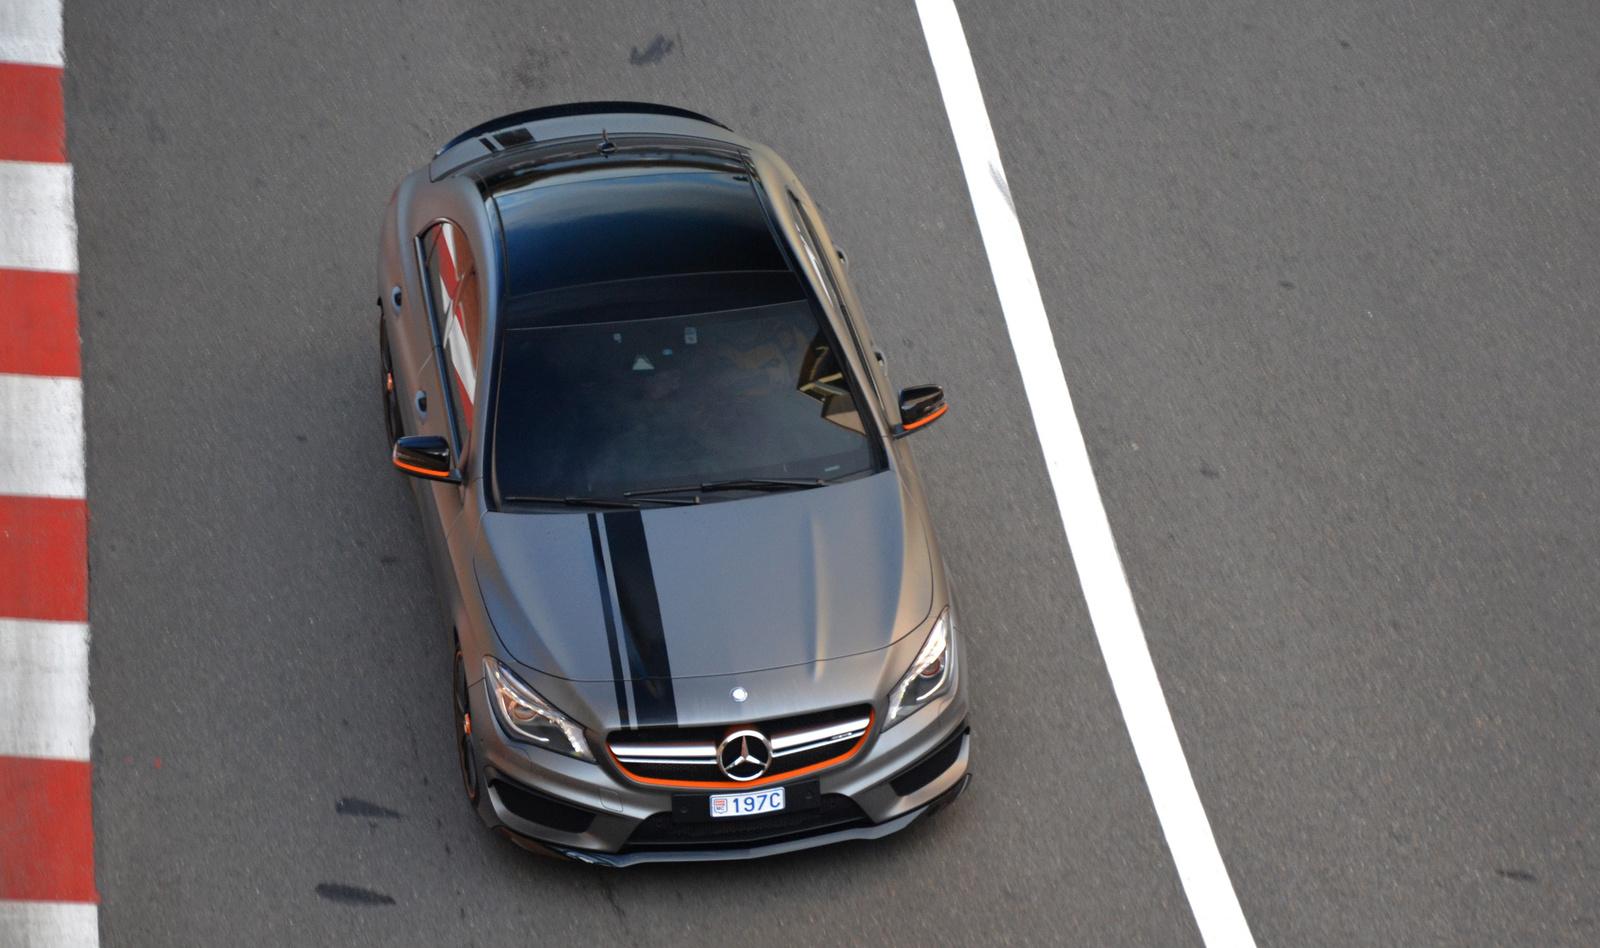 Mercedes-Benz CLA 45 AMG OrangeArt Edition